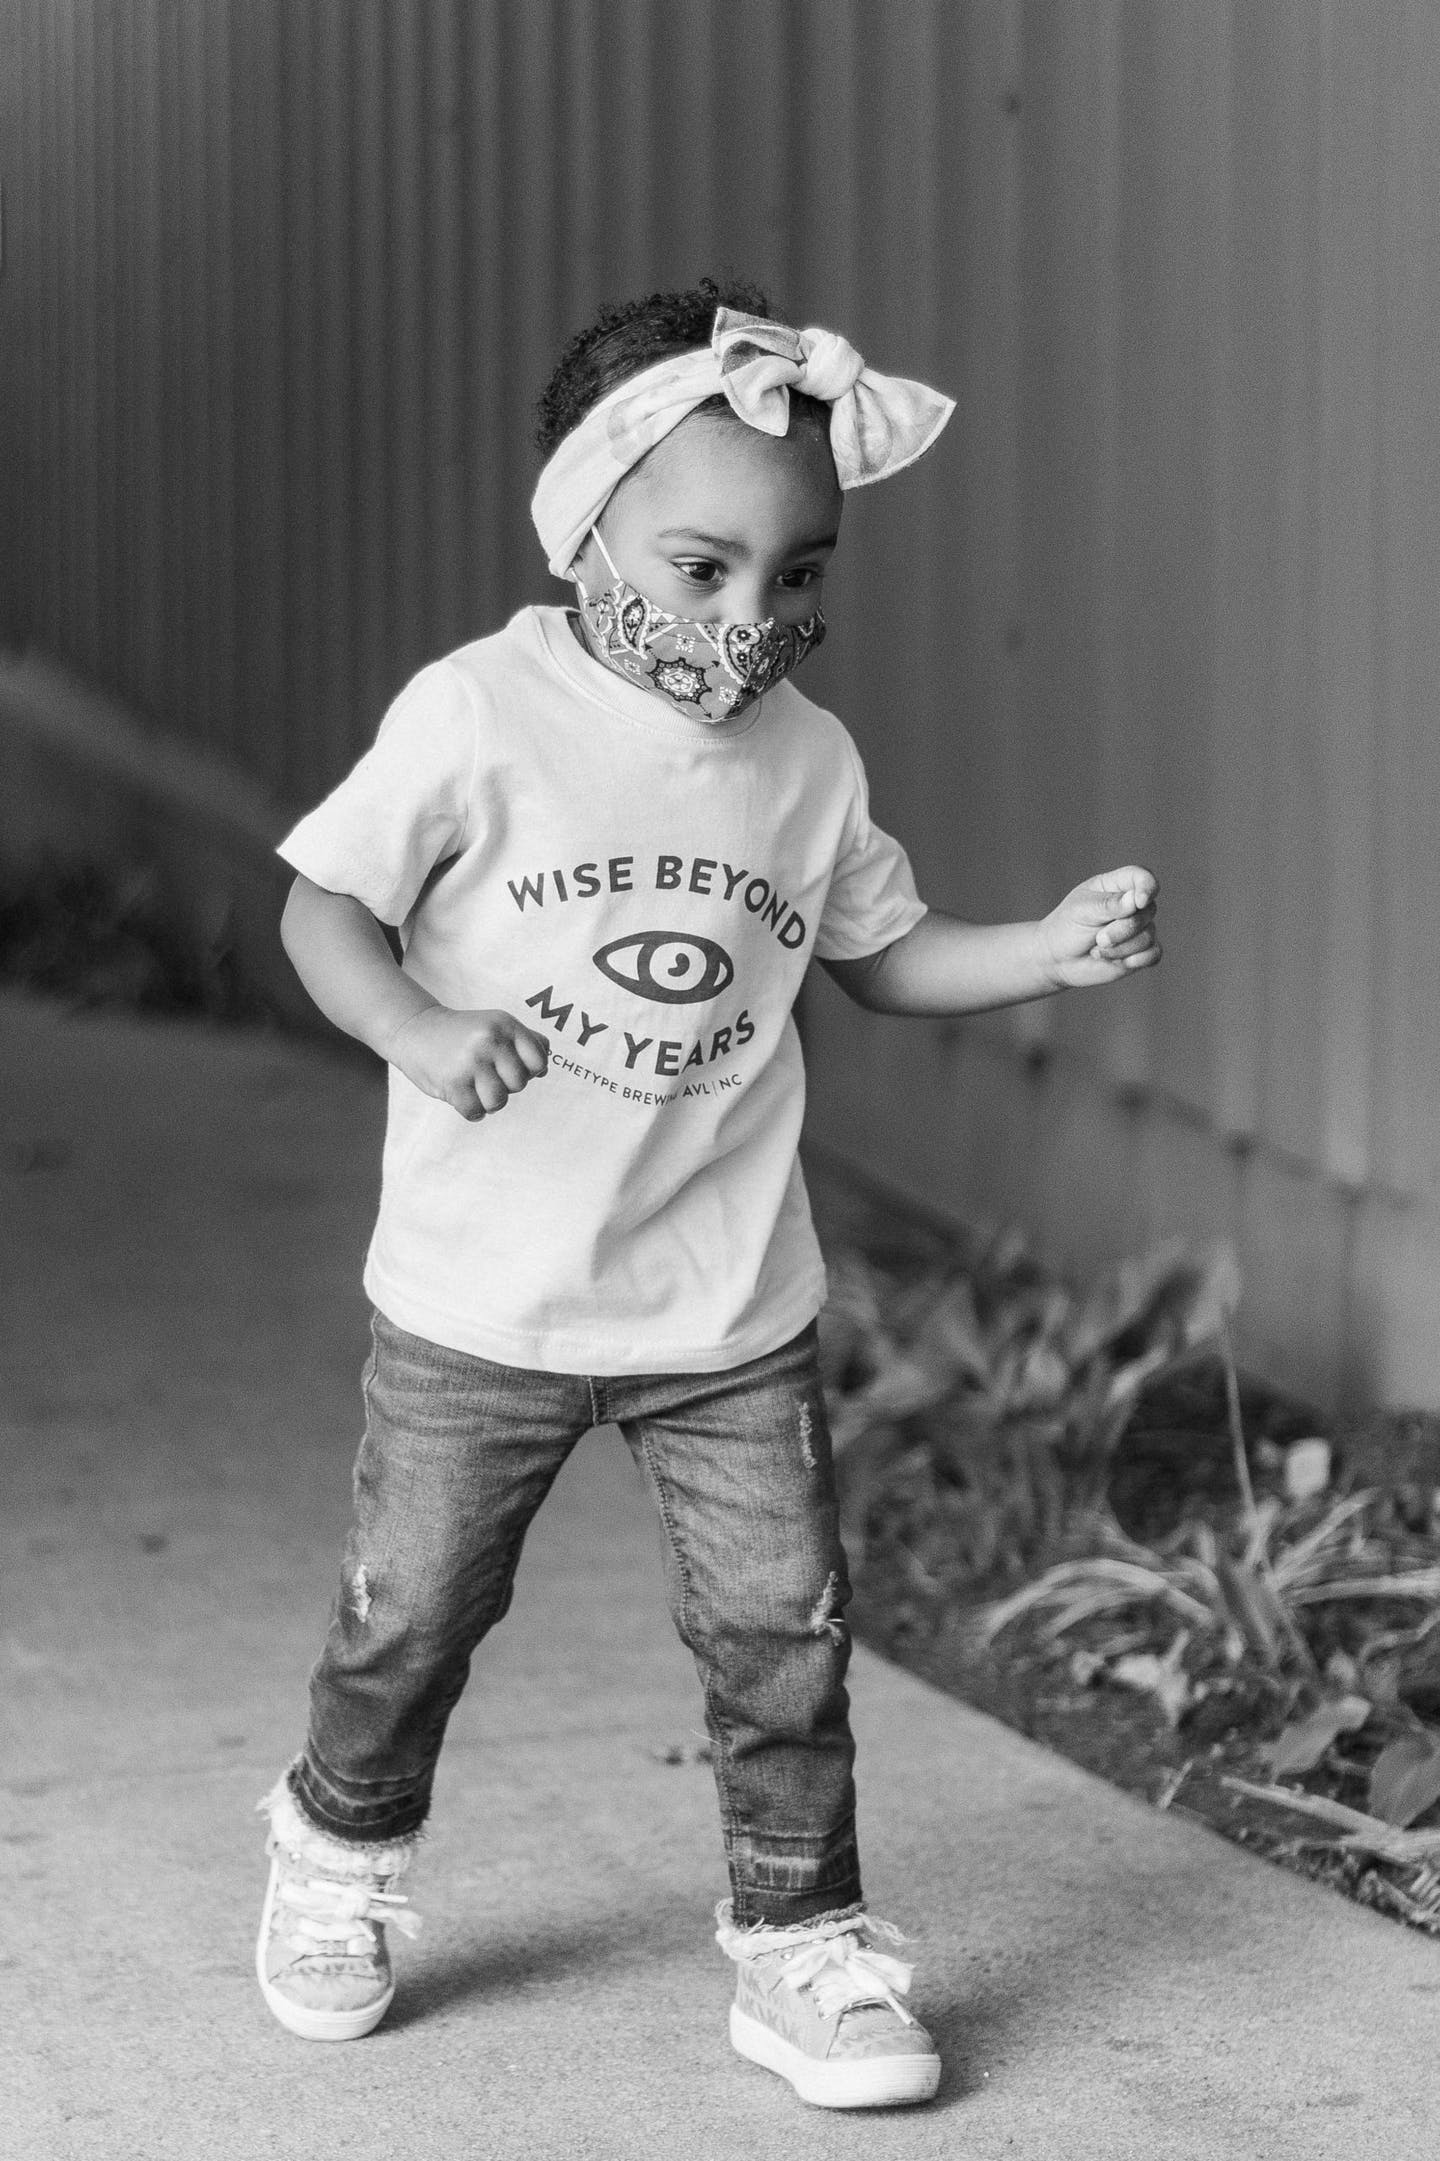 2020_Kids Shirt Inventory_ Carlos Maldonado Romero - 9